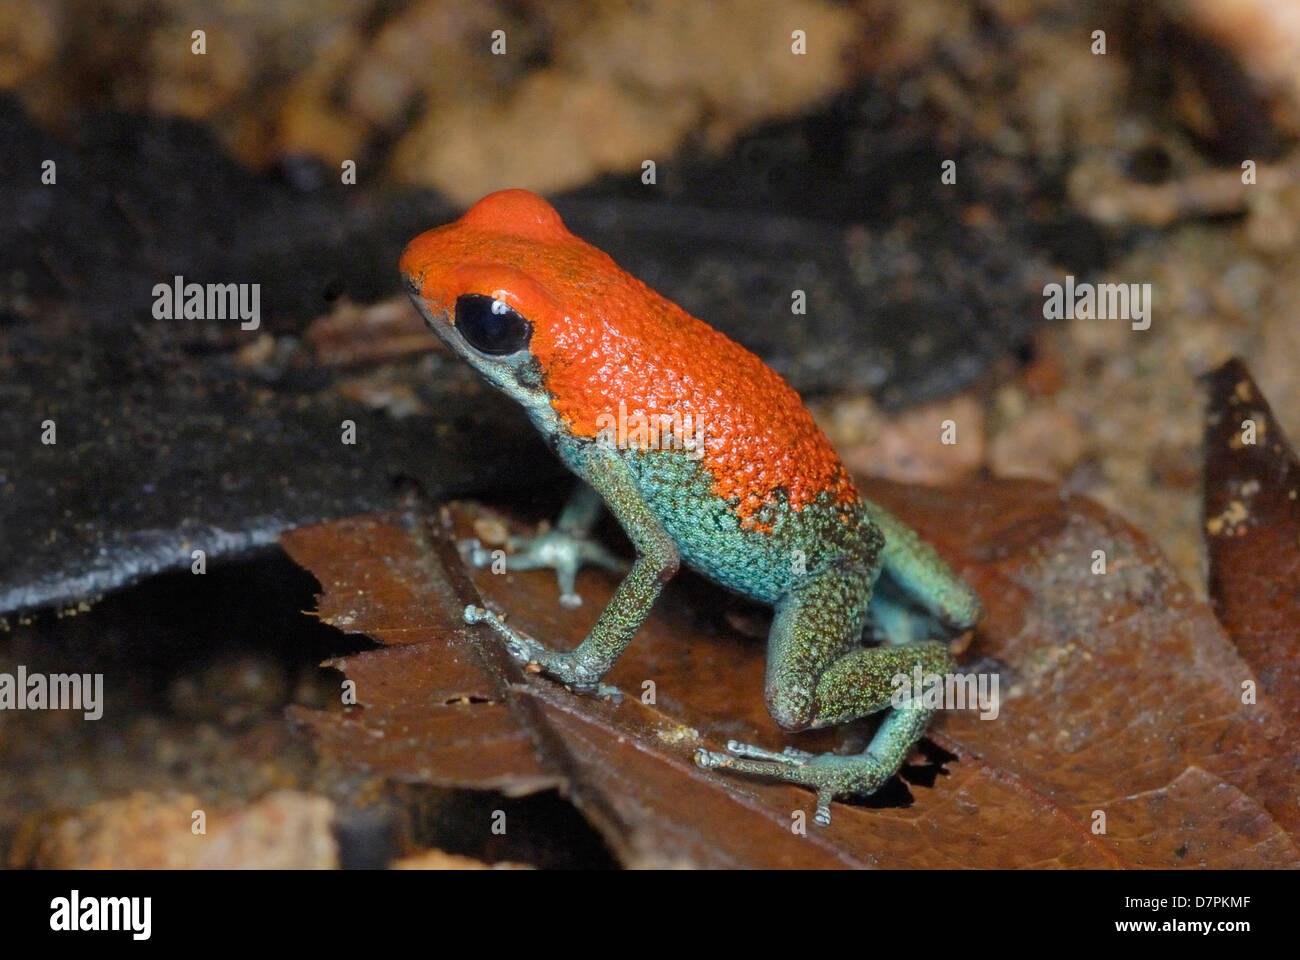 Granular Poison Dart Frog (Dendrobates granuliferus) in Costa Rica rainforest - Stock Image